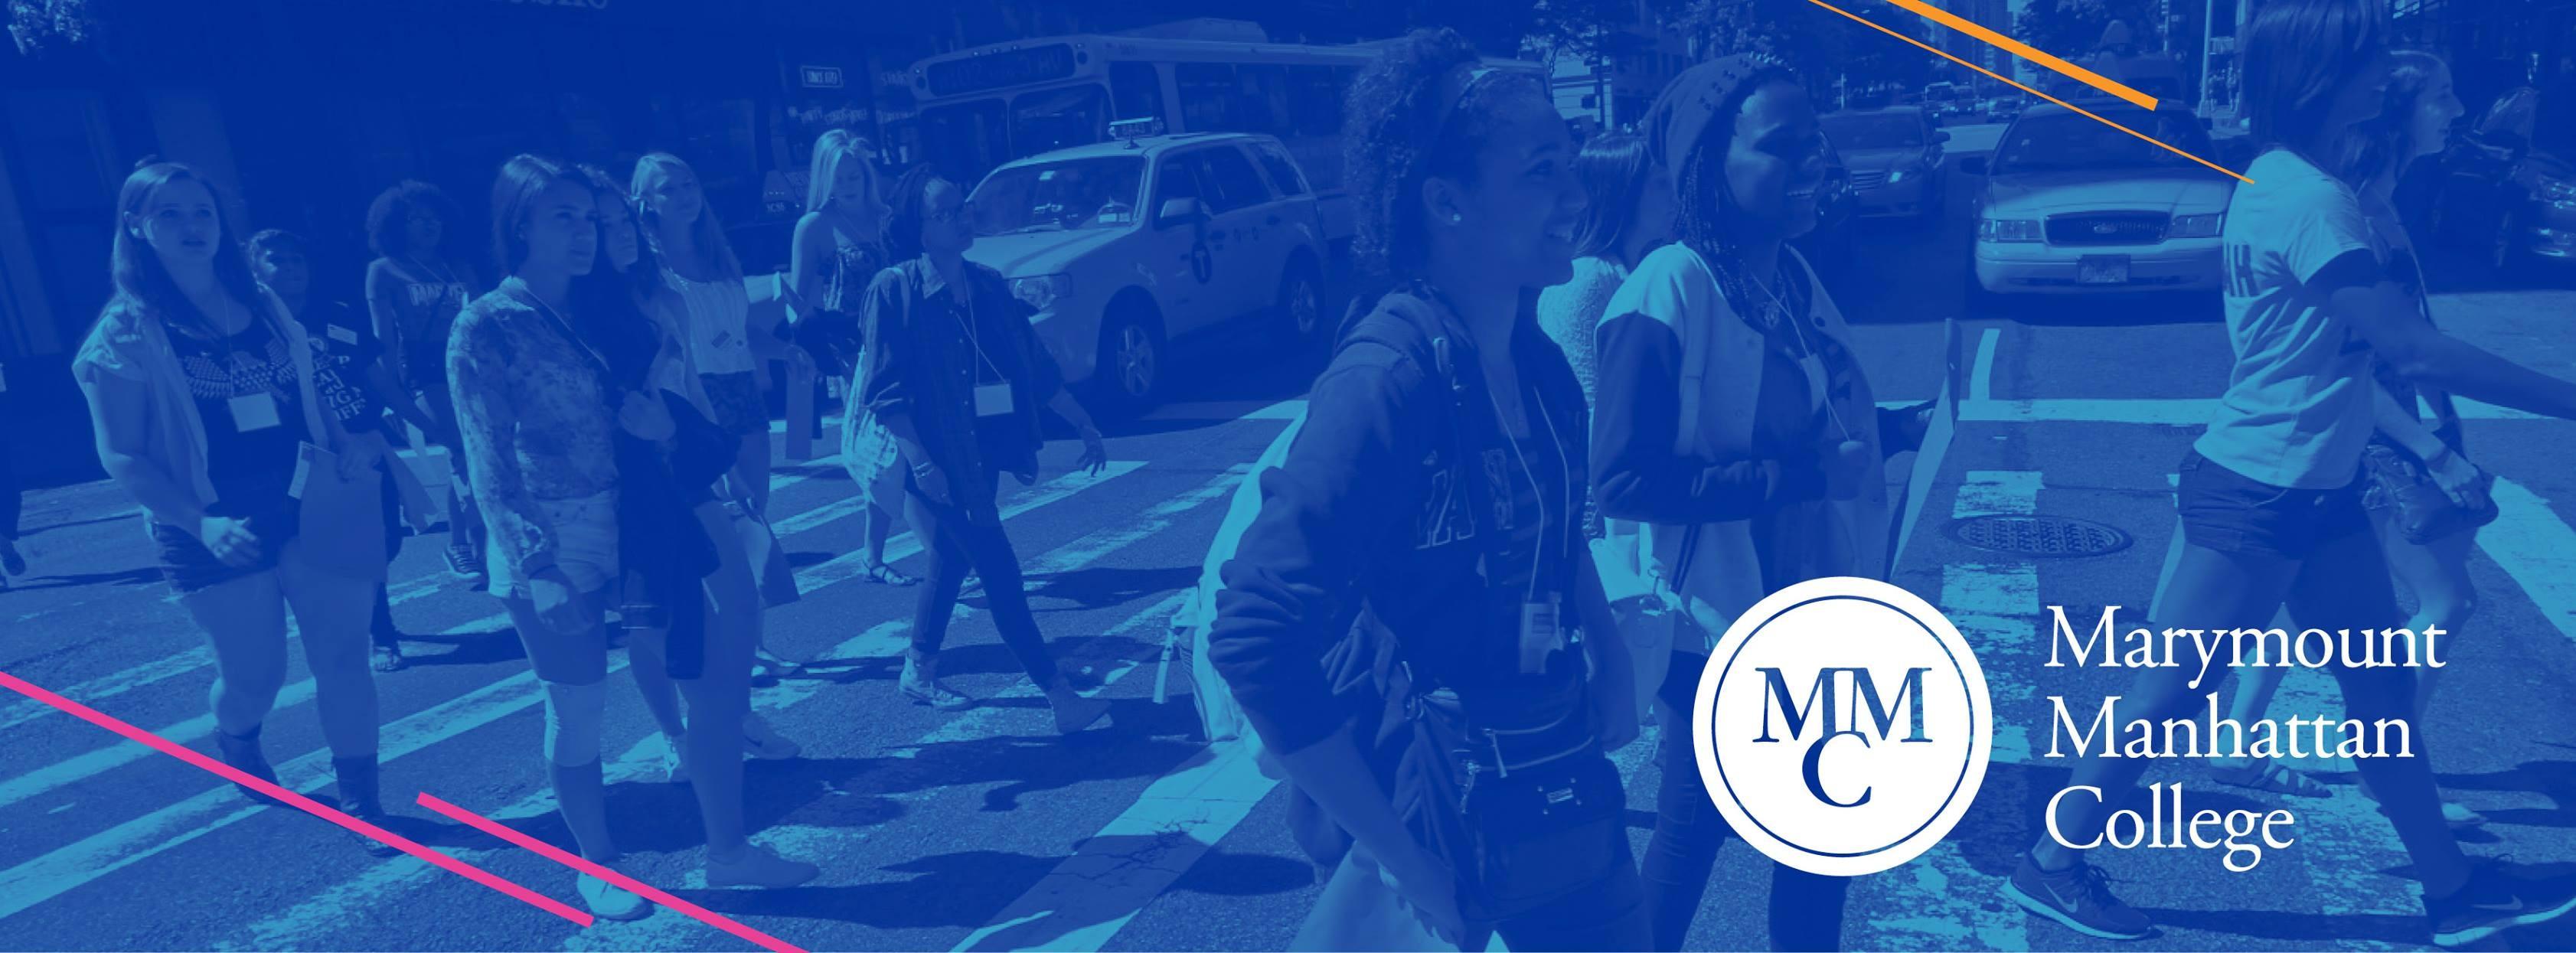 Marymount Manhattan College Linkedin